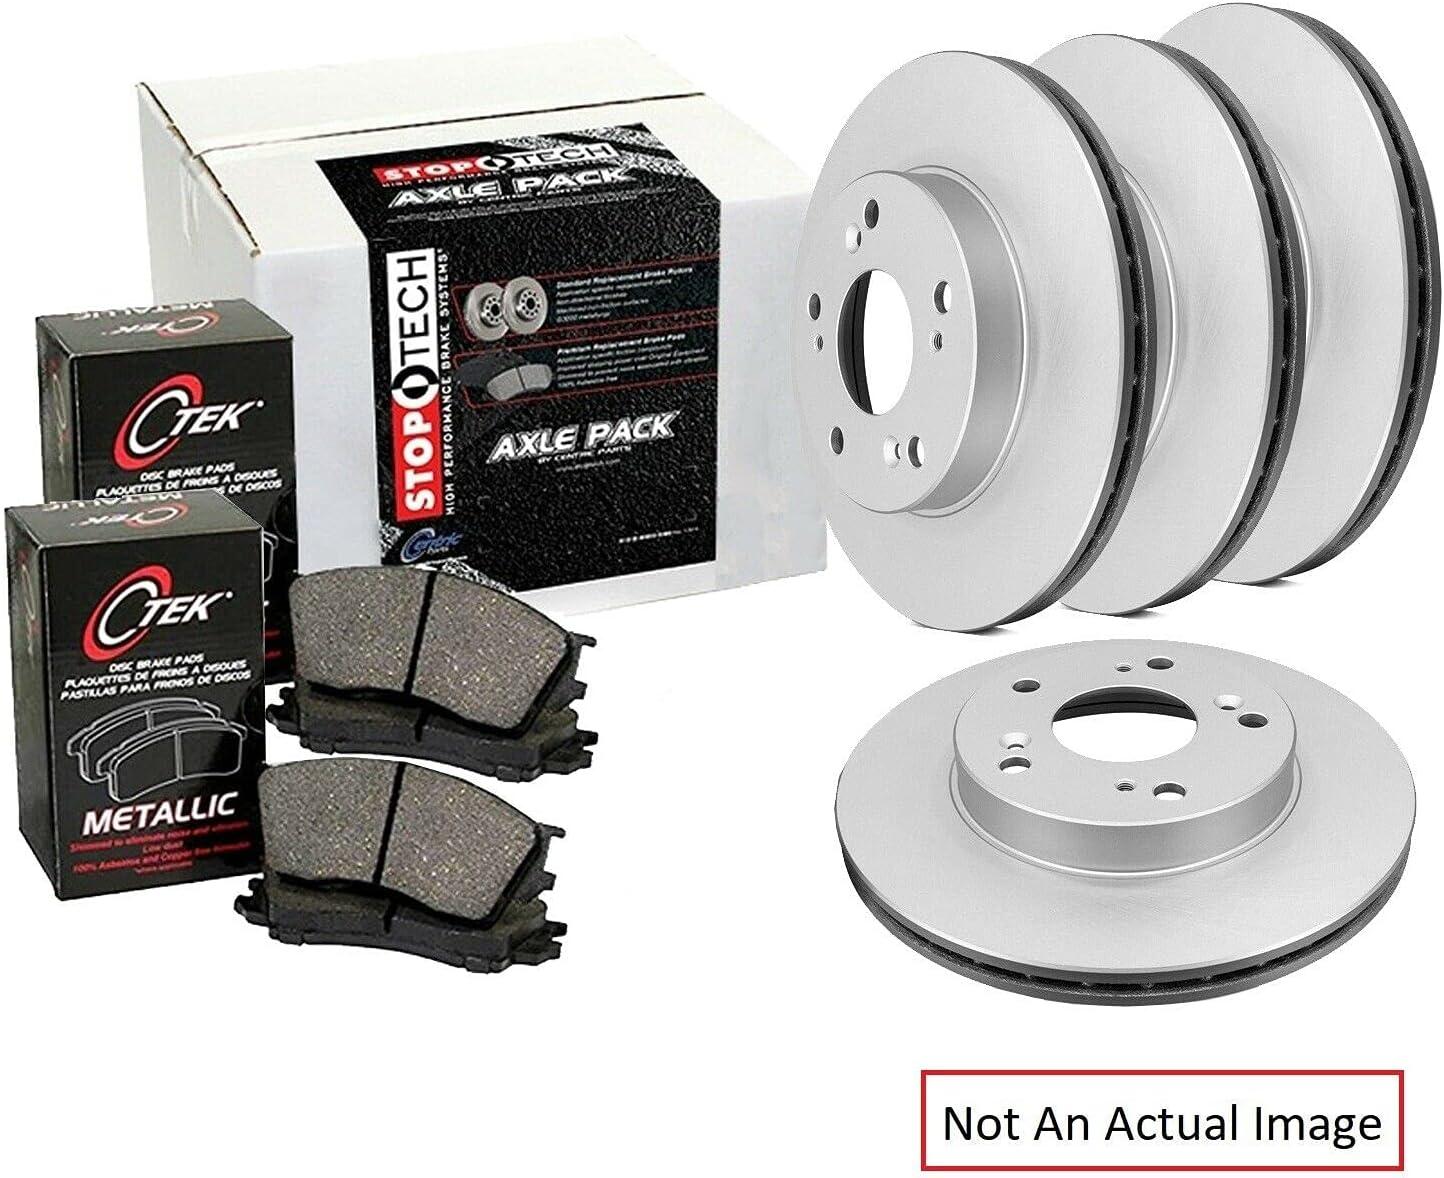 Save money Semi-Metallic Front and Rear Disc Brake Rotor Pad overseas Kit